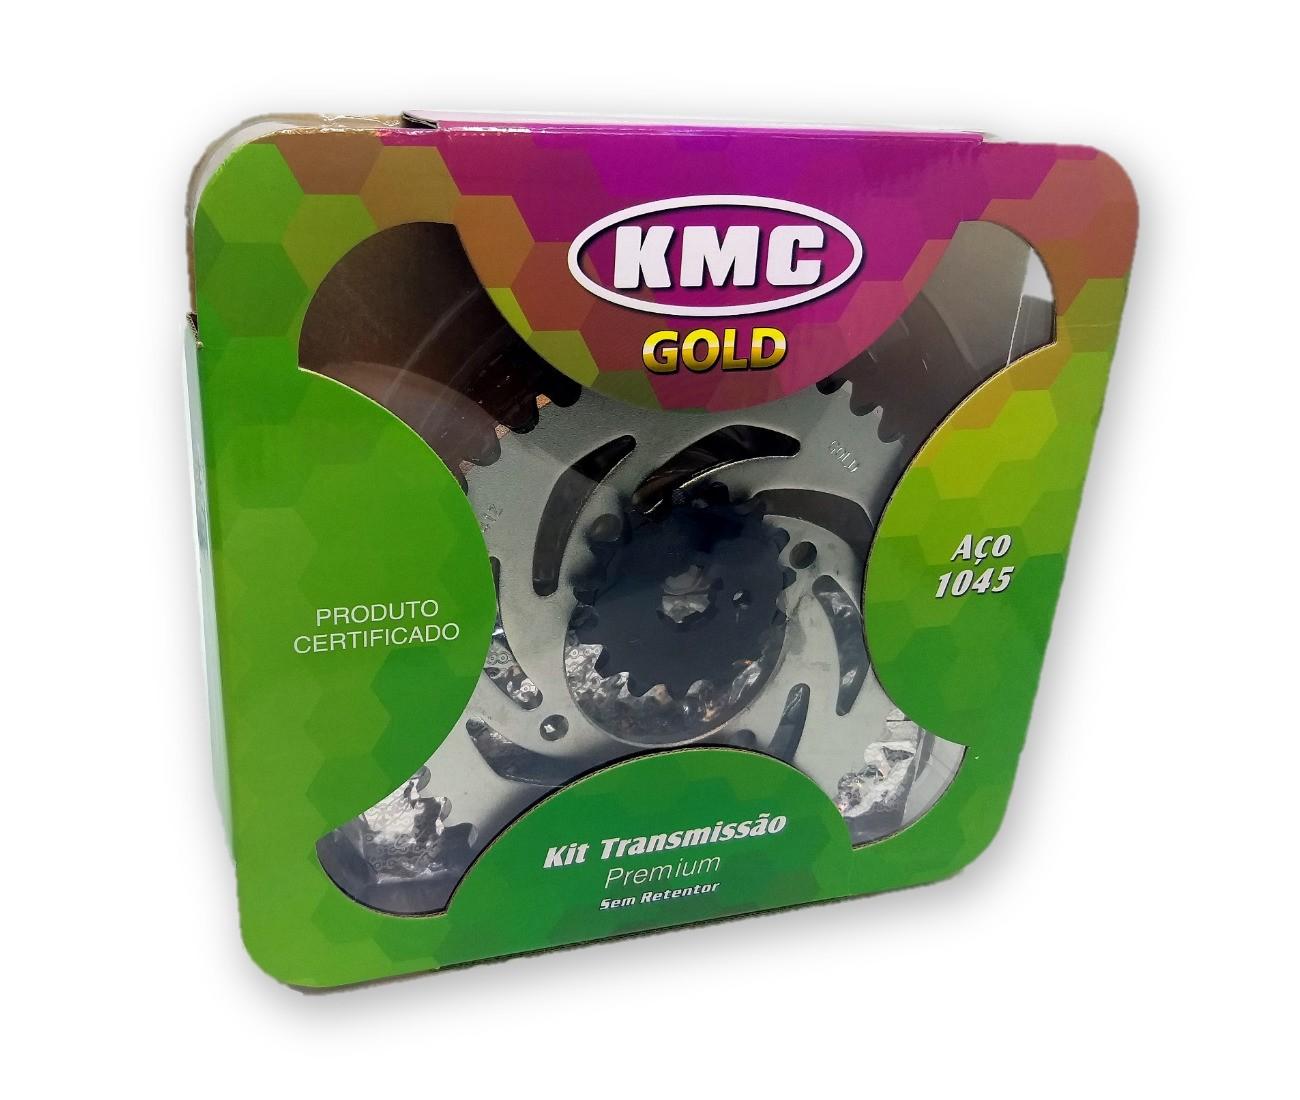 Kit Relação Crypton 115 2011 Aço 1045 KMC GOLD 420x108x41x15